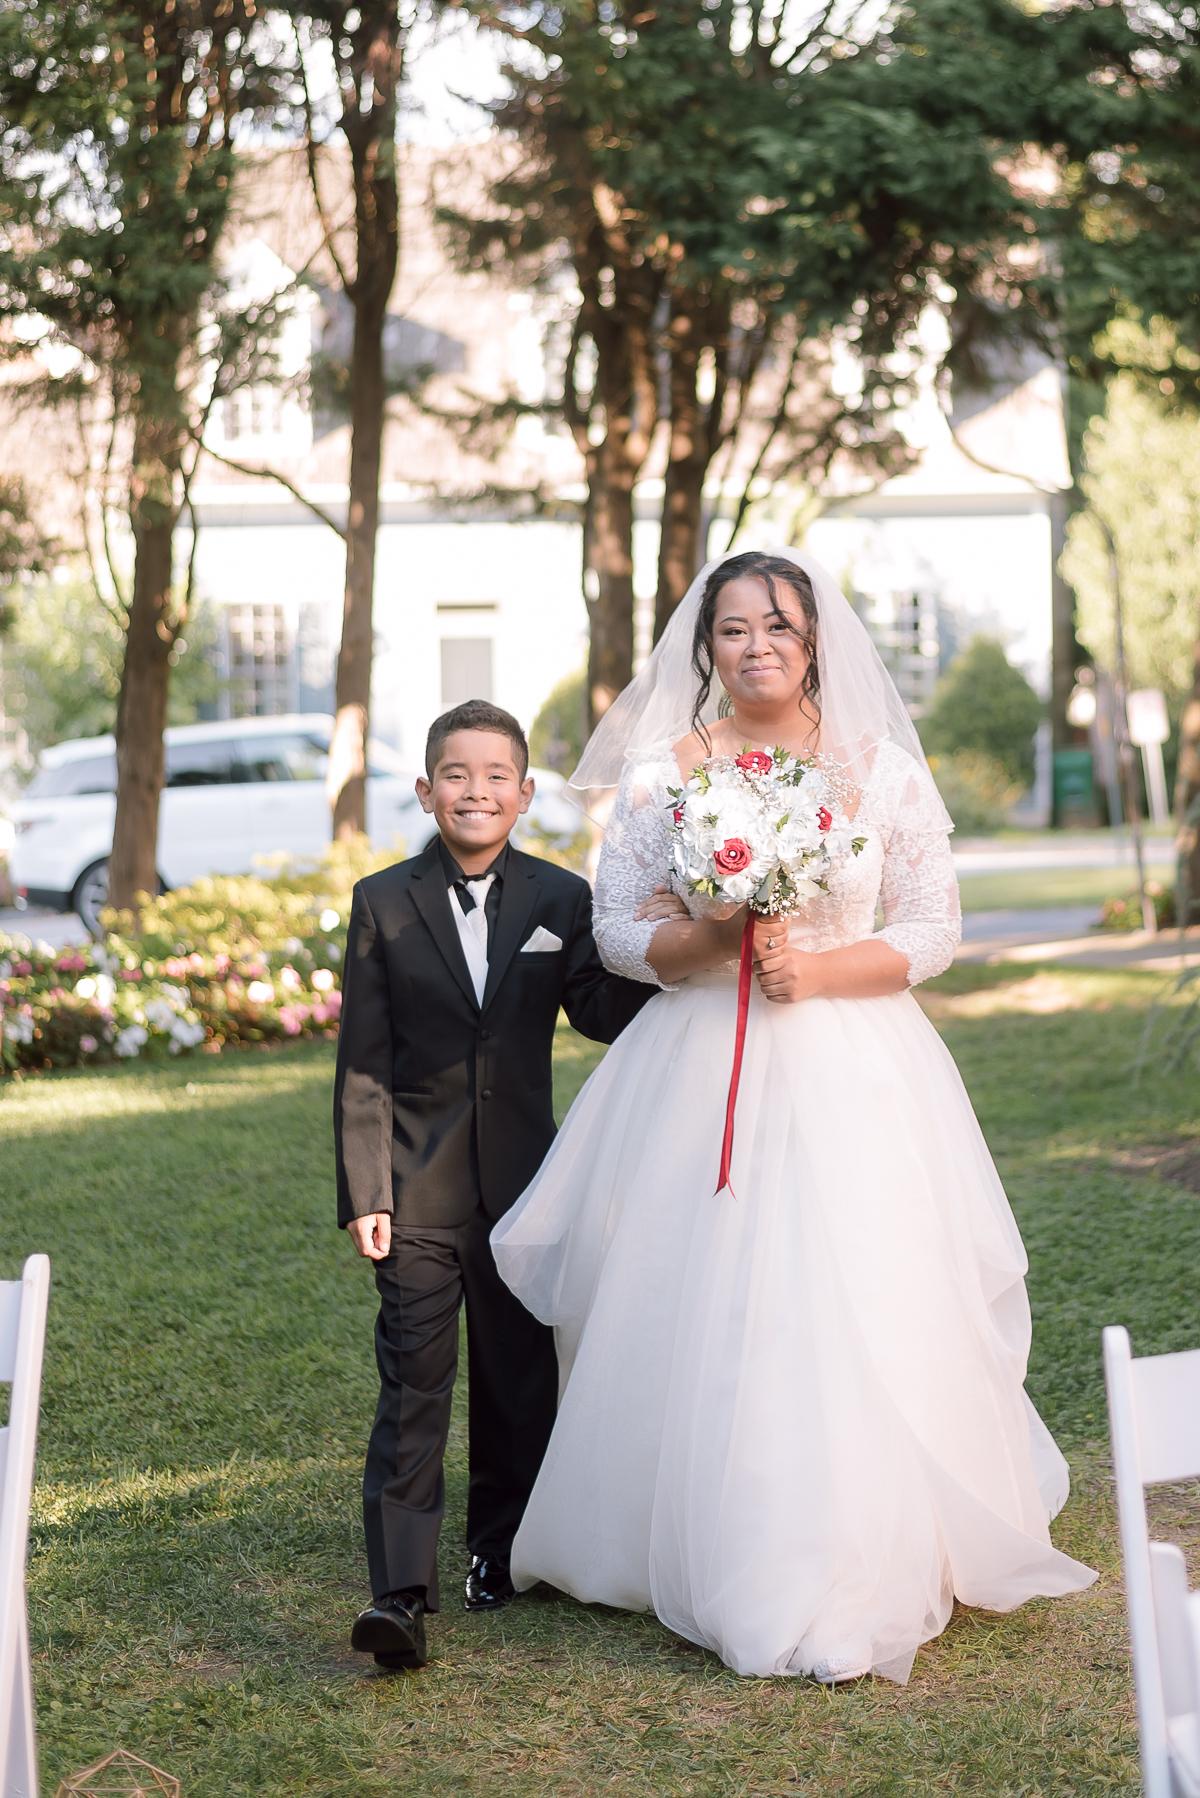 Maryland-Kentlands-Mansion-Wedding-Bride-Groom-64.jpg